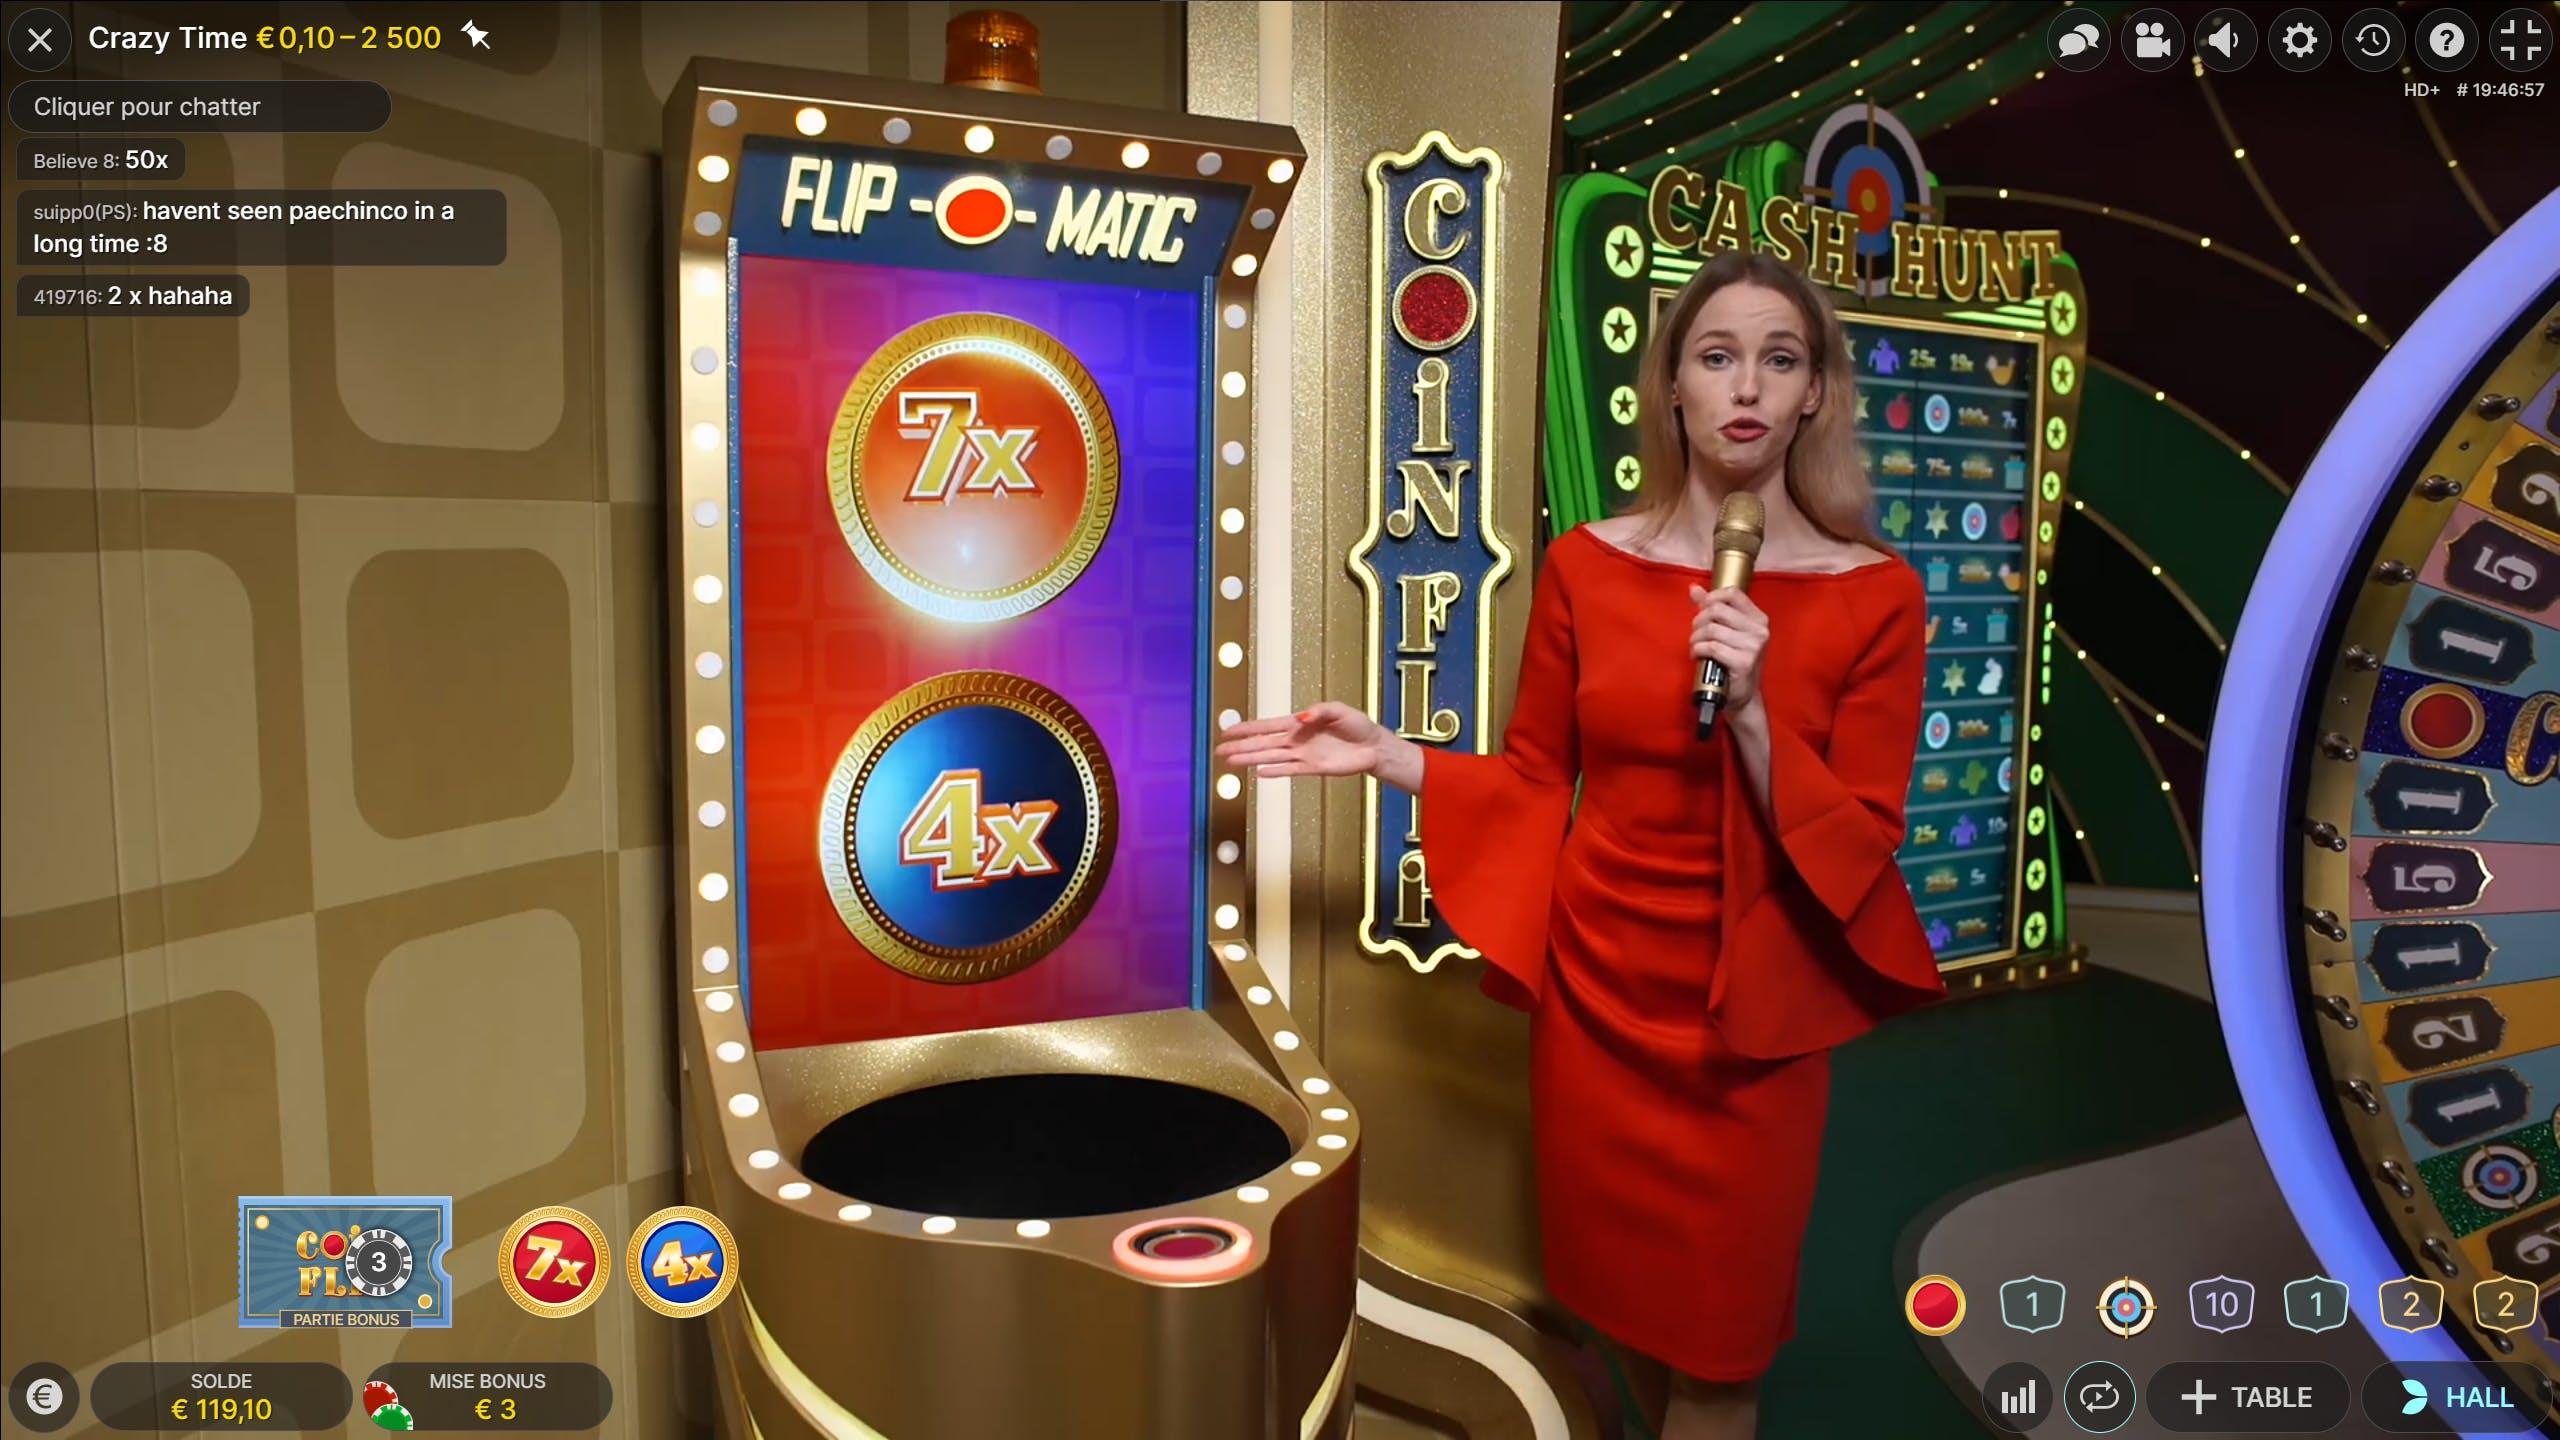 crazy time à jouer sur cresus casino avec kagino fr